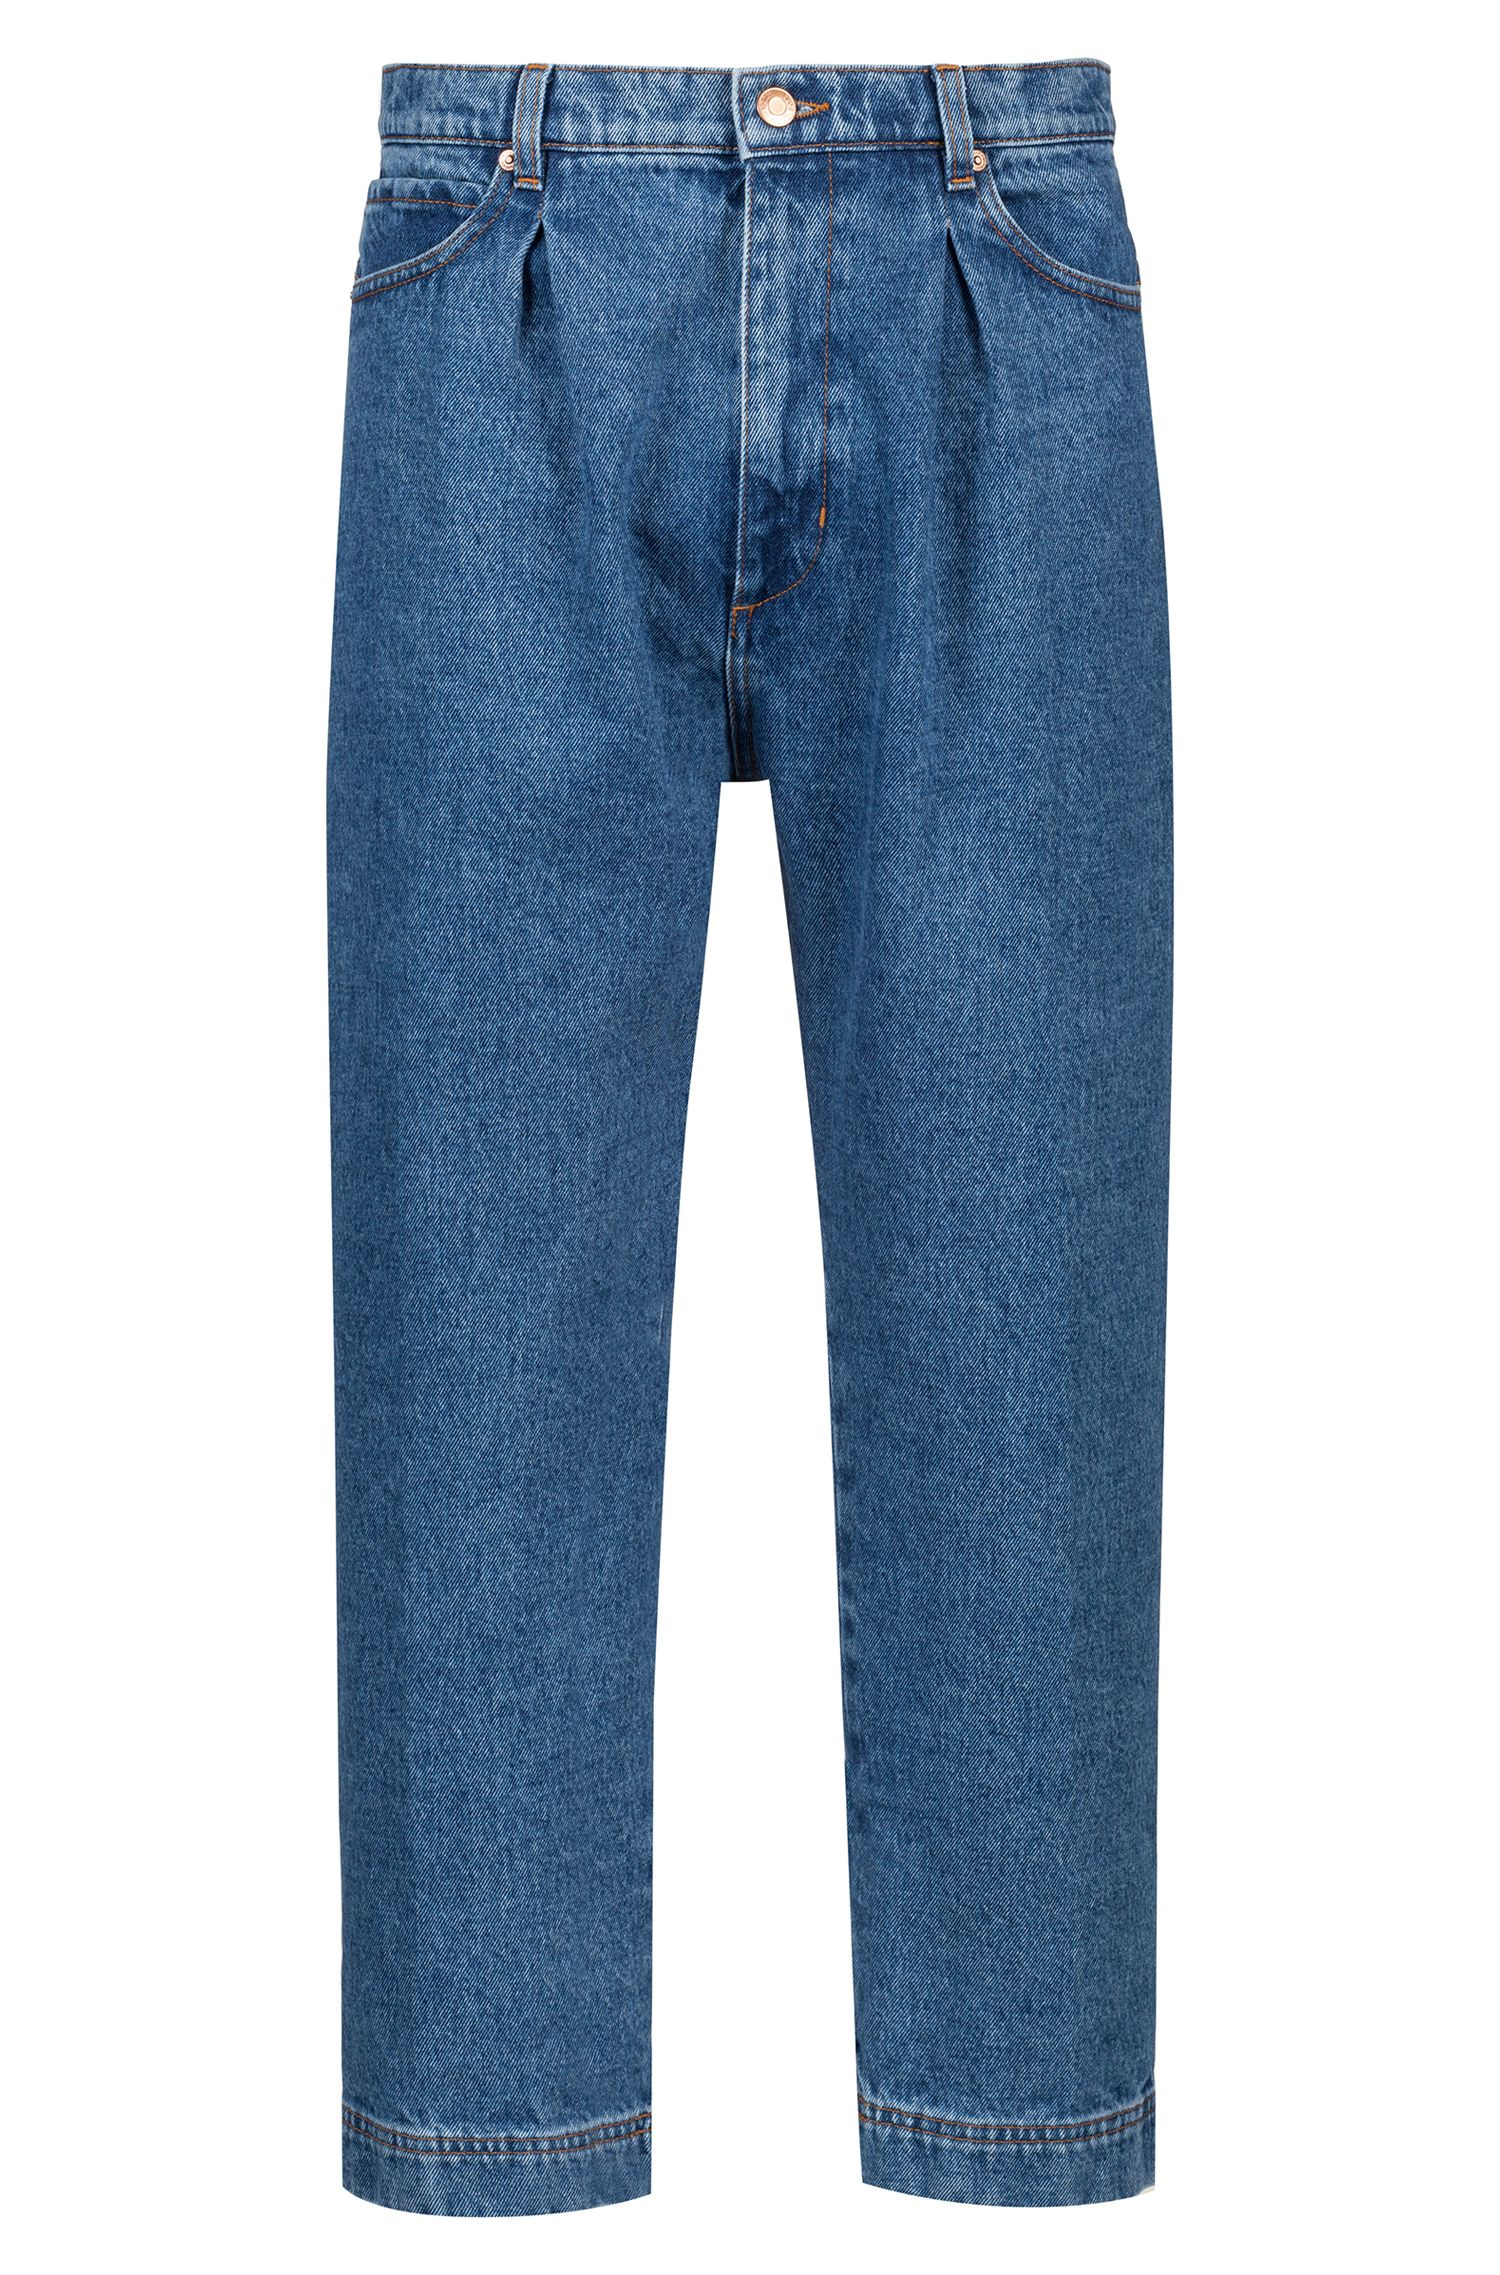 Hugo Boss - Relaxed-Fit Jeans in Cropped-Länge mit Bundfalten - 1